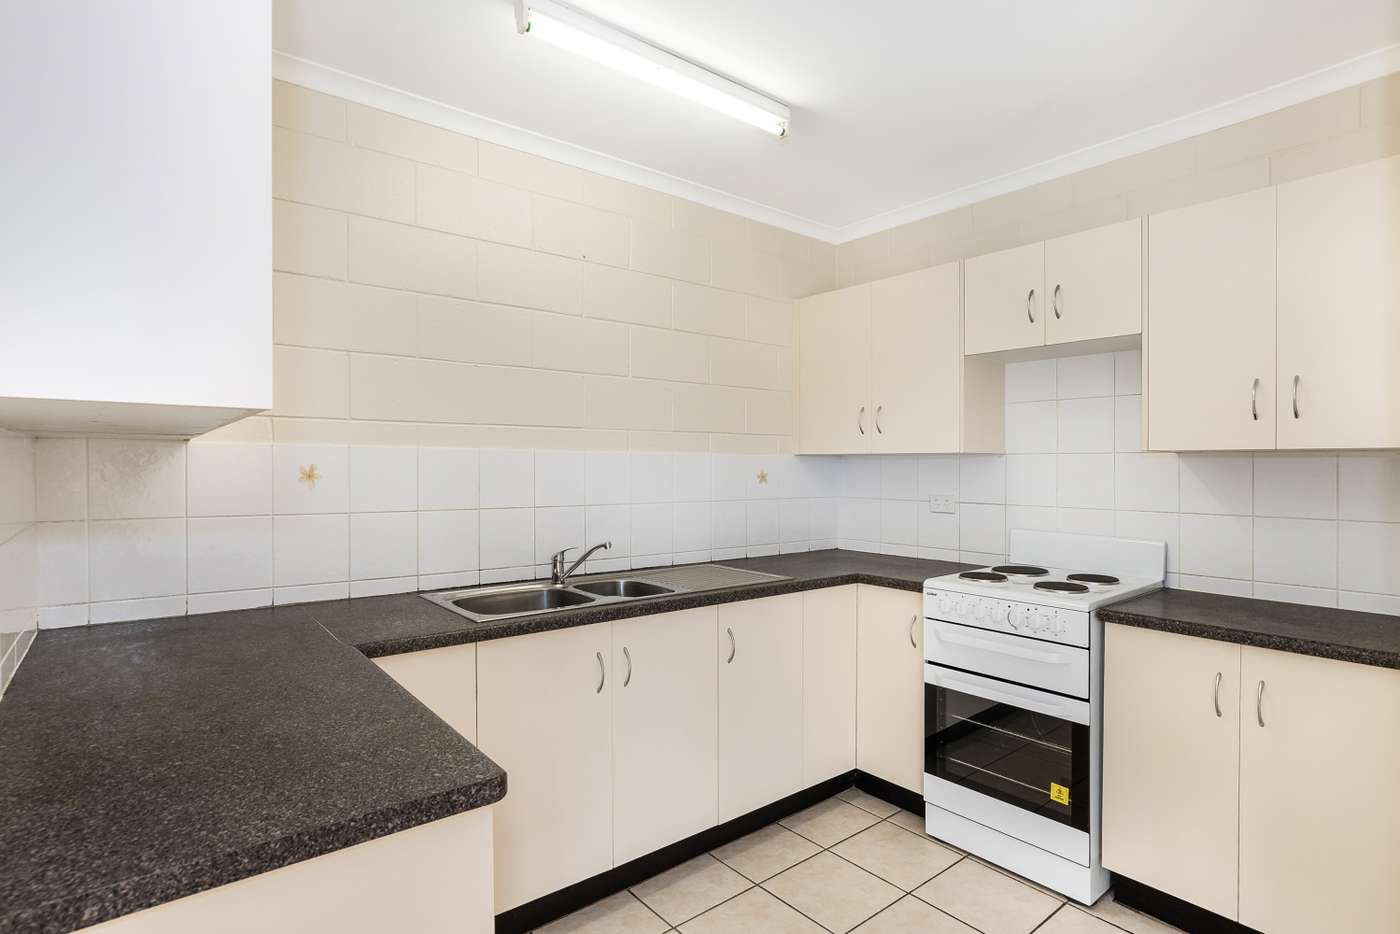 Main view of Homely apartment listing, 3/7 Narangi Street, Heatley QLD 4814